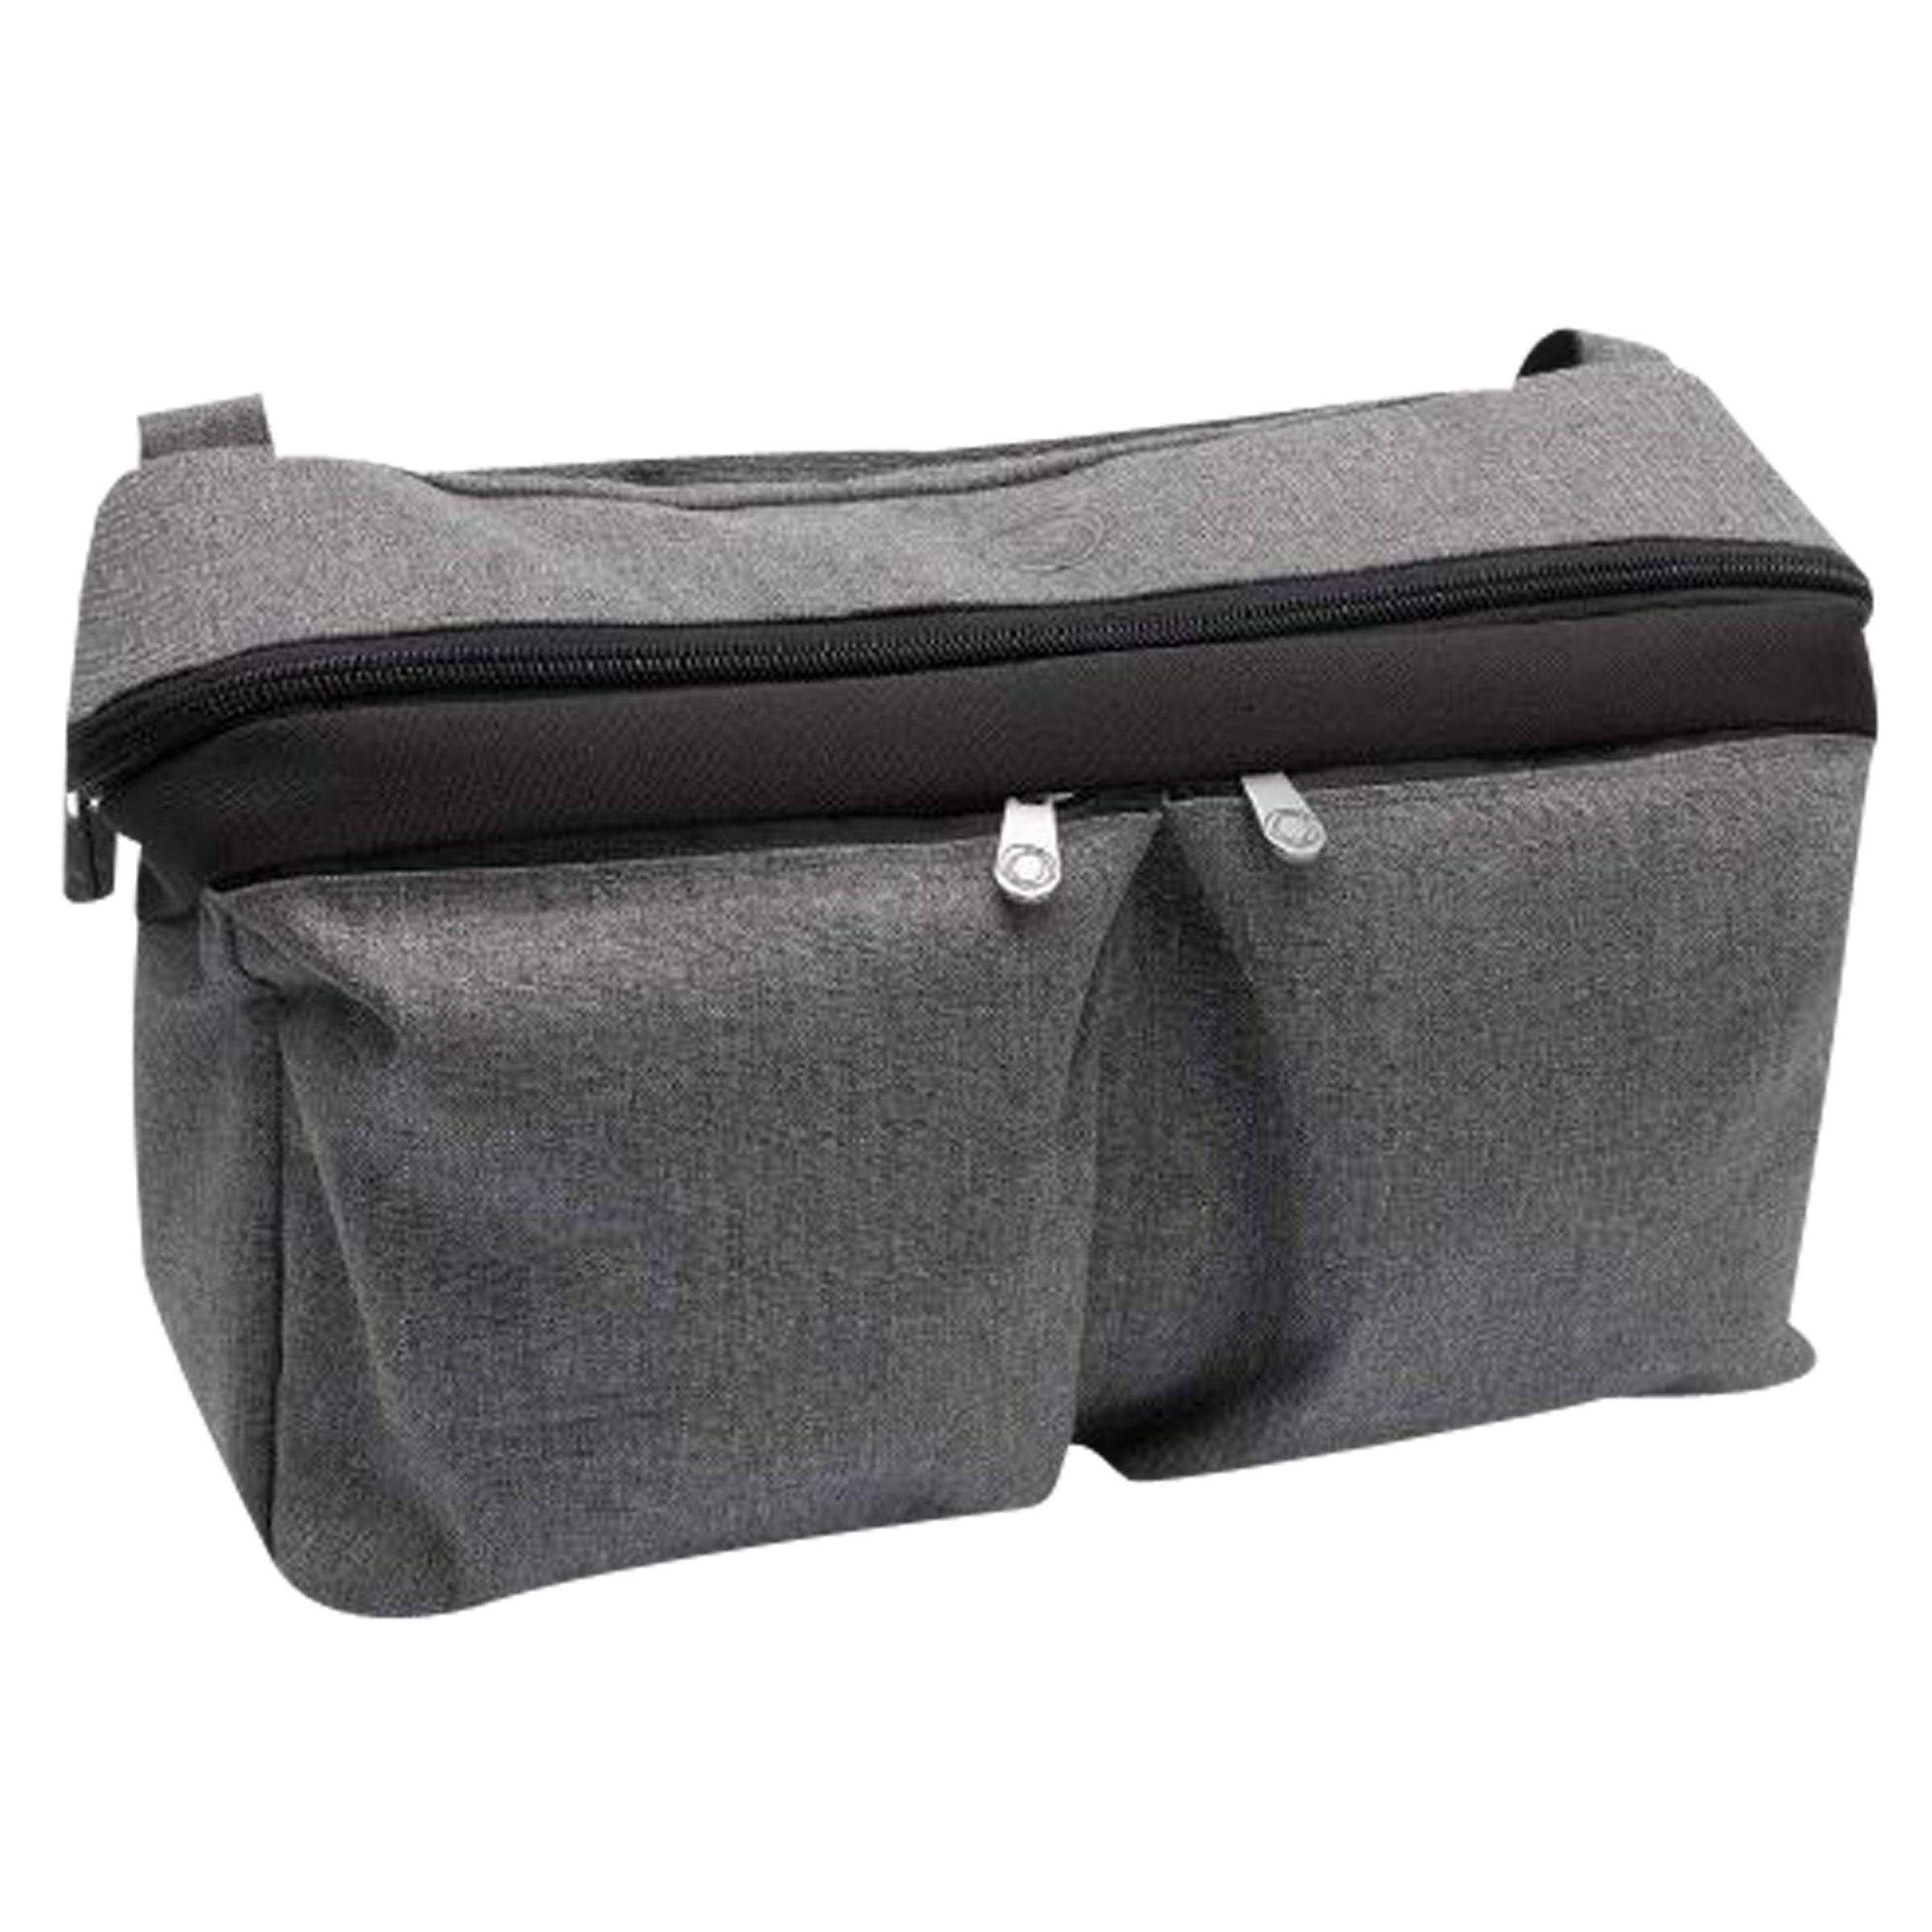 Blue Melange Attaches to Handlebar Bugaboo Universal Pushchair Organiser Bag